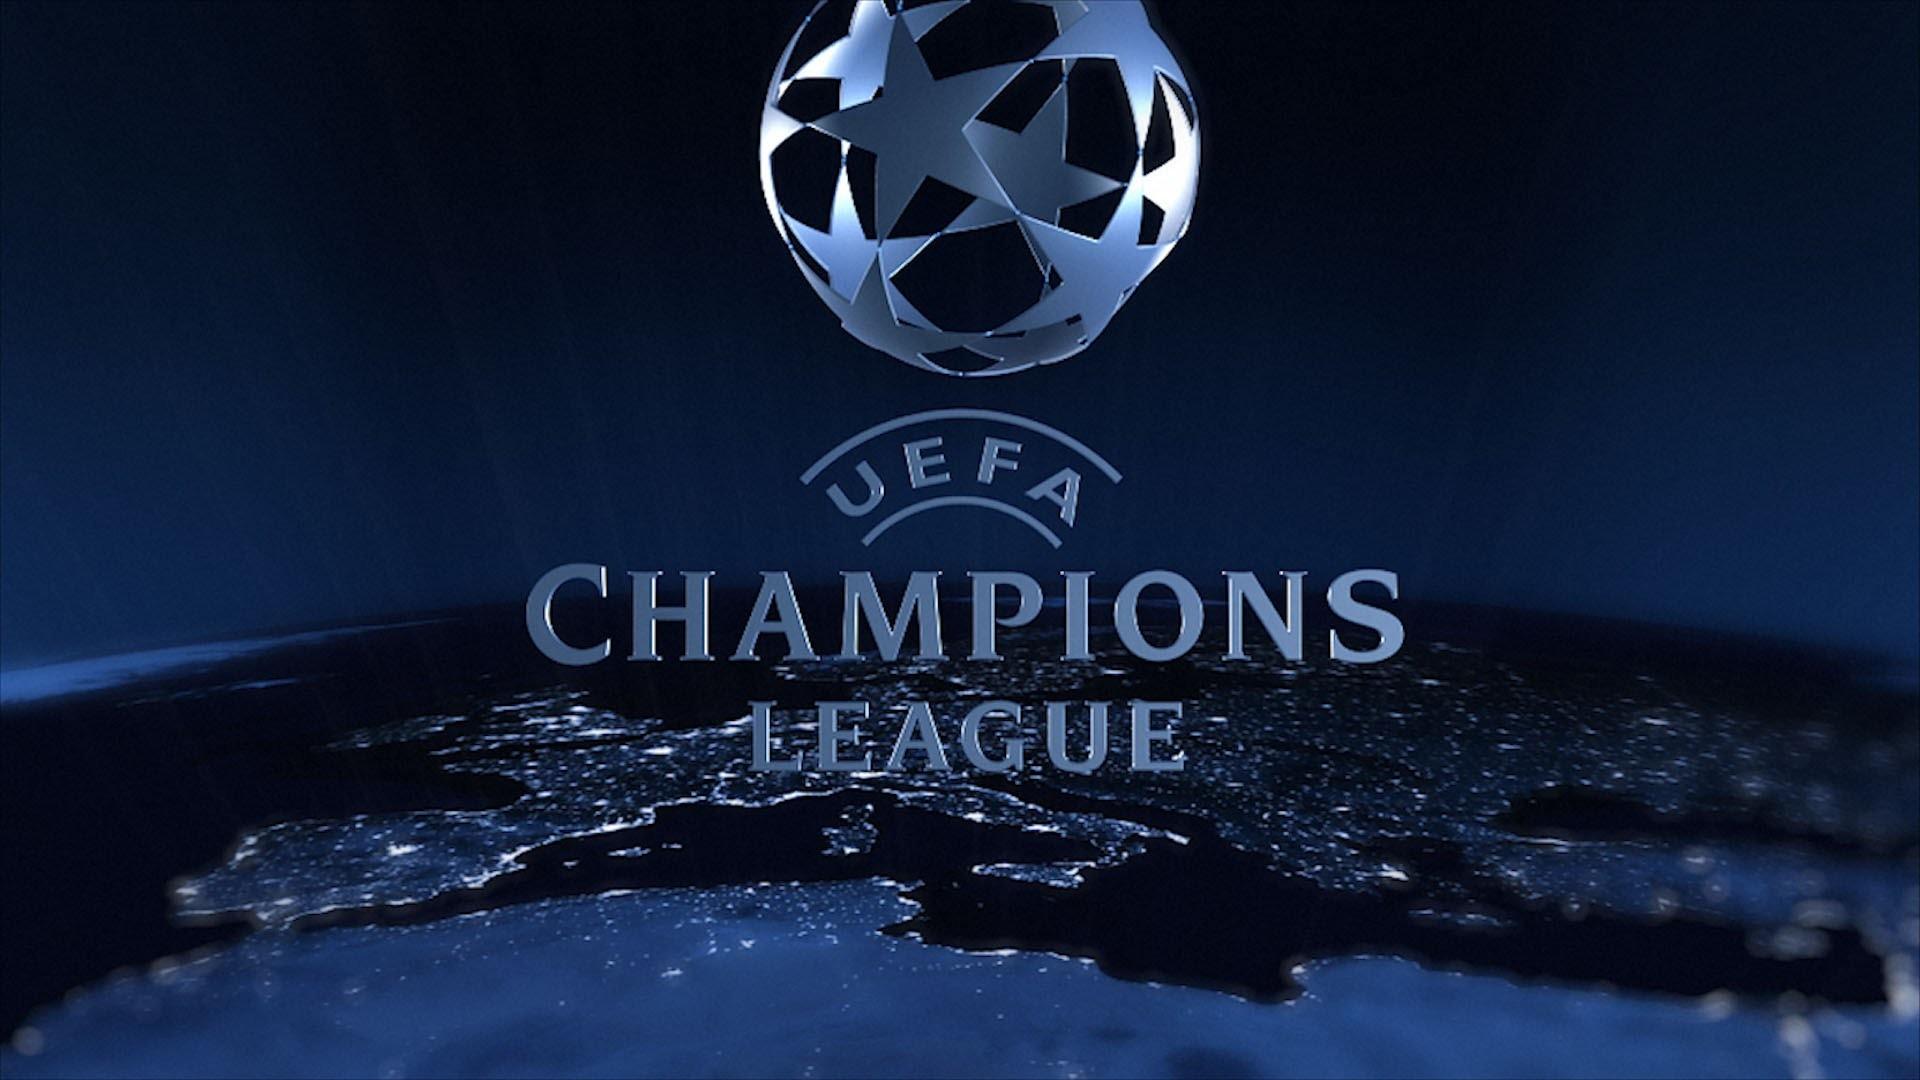 Uefa Champions League Wallpaper HD (72+ images)